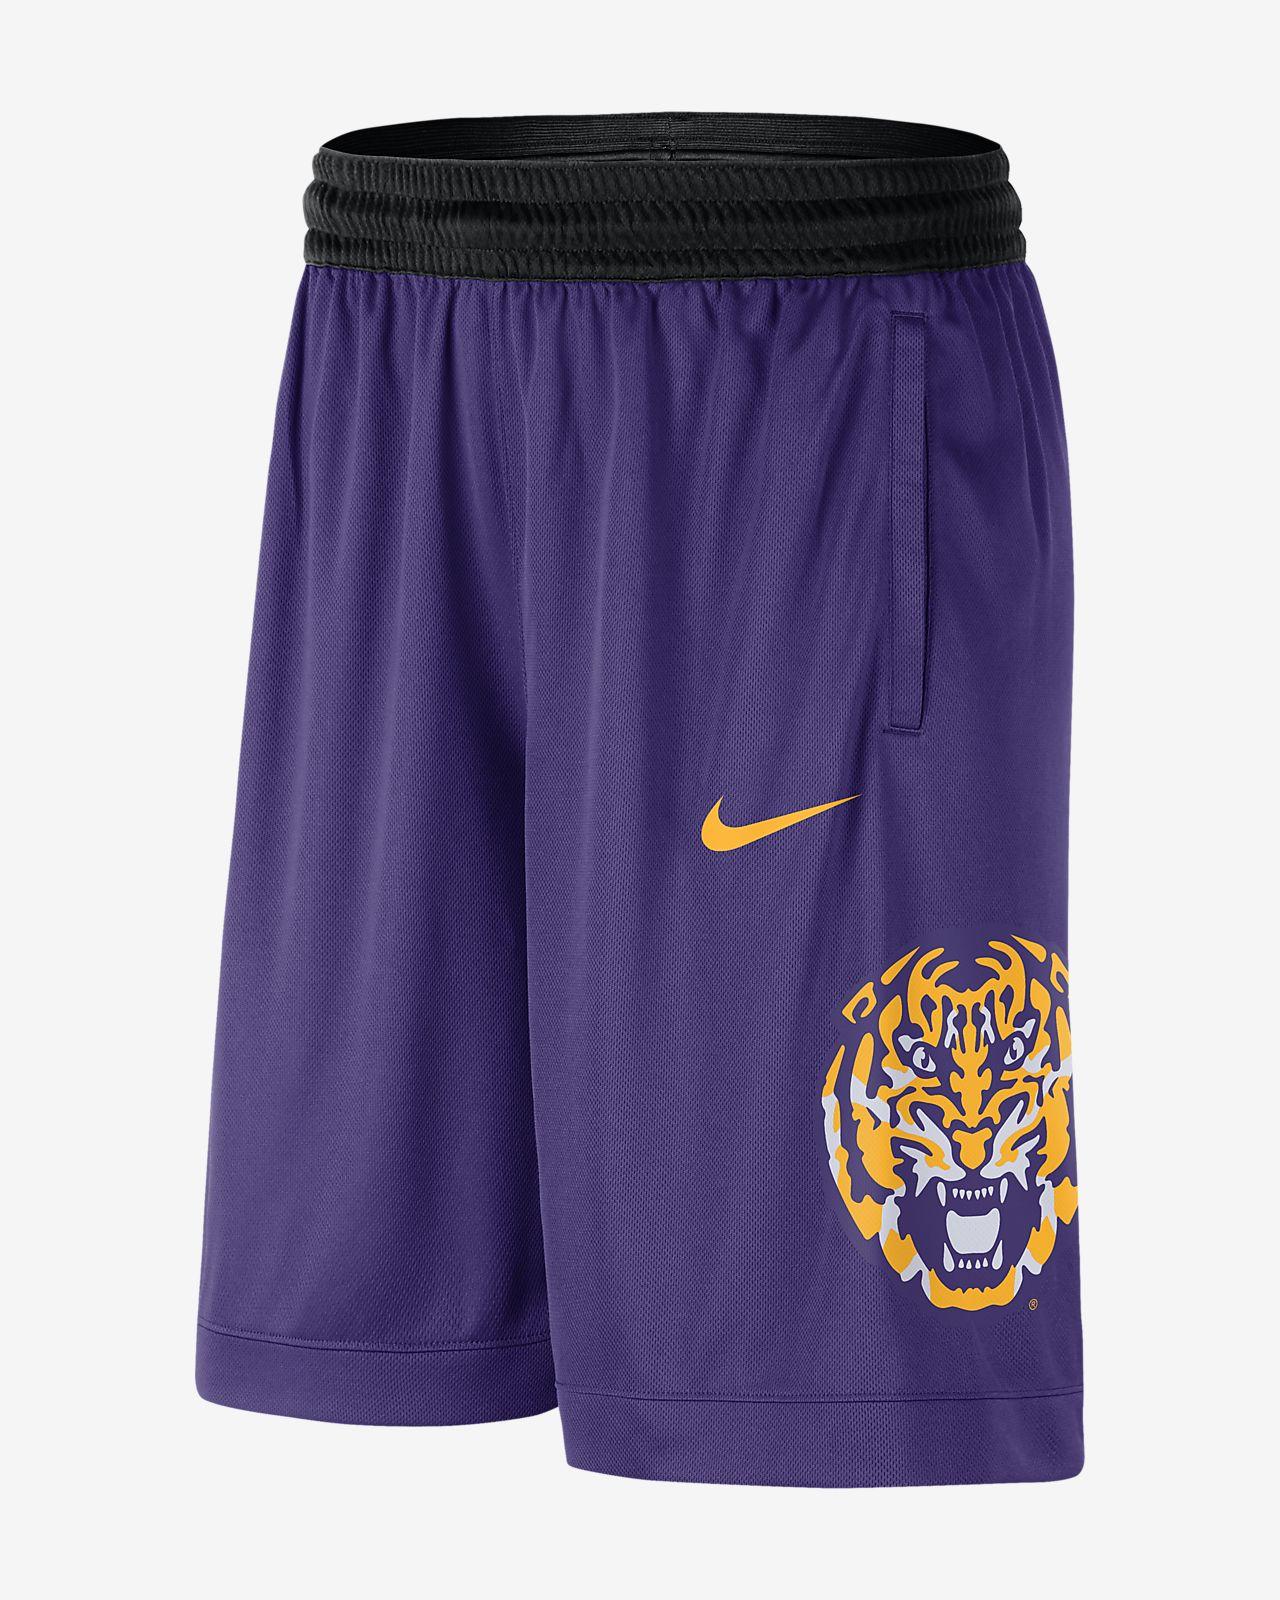 Nike College Dri-FIT (LSU) Men's Basketball Shorts